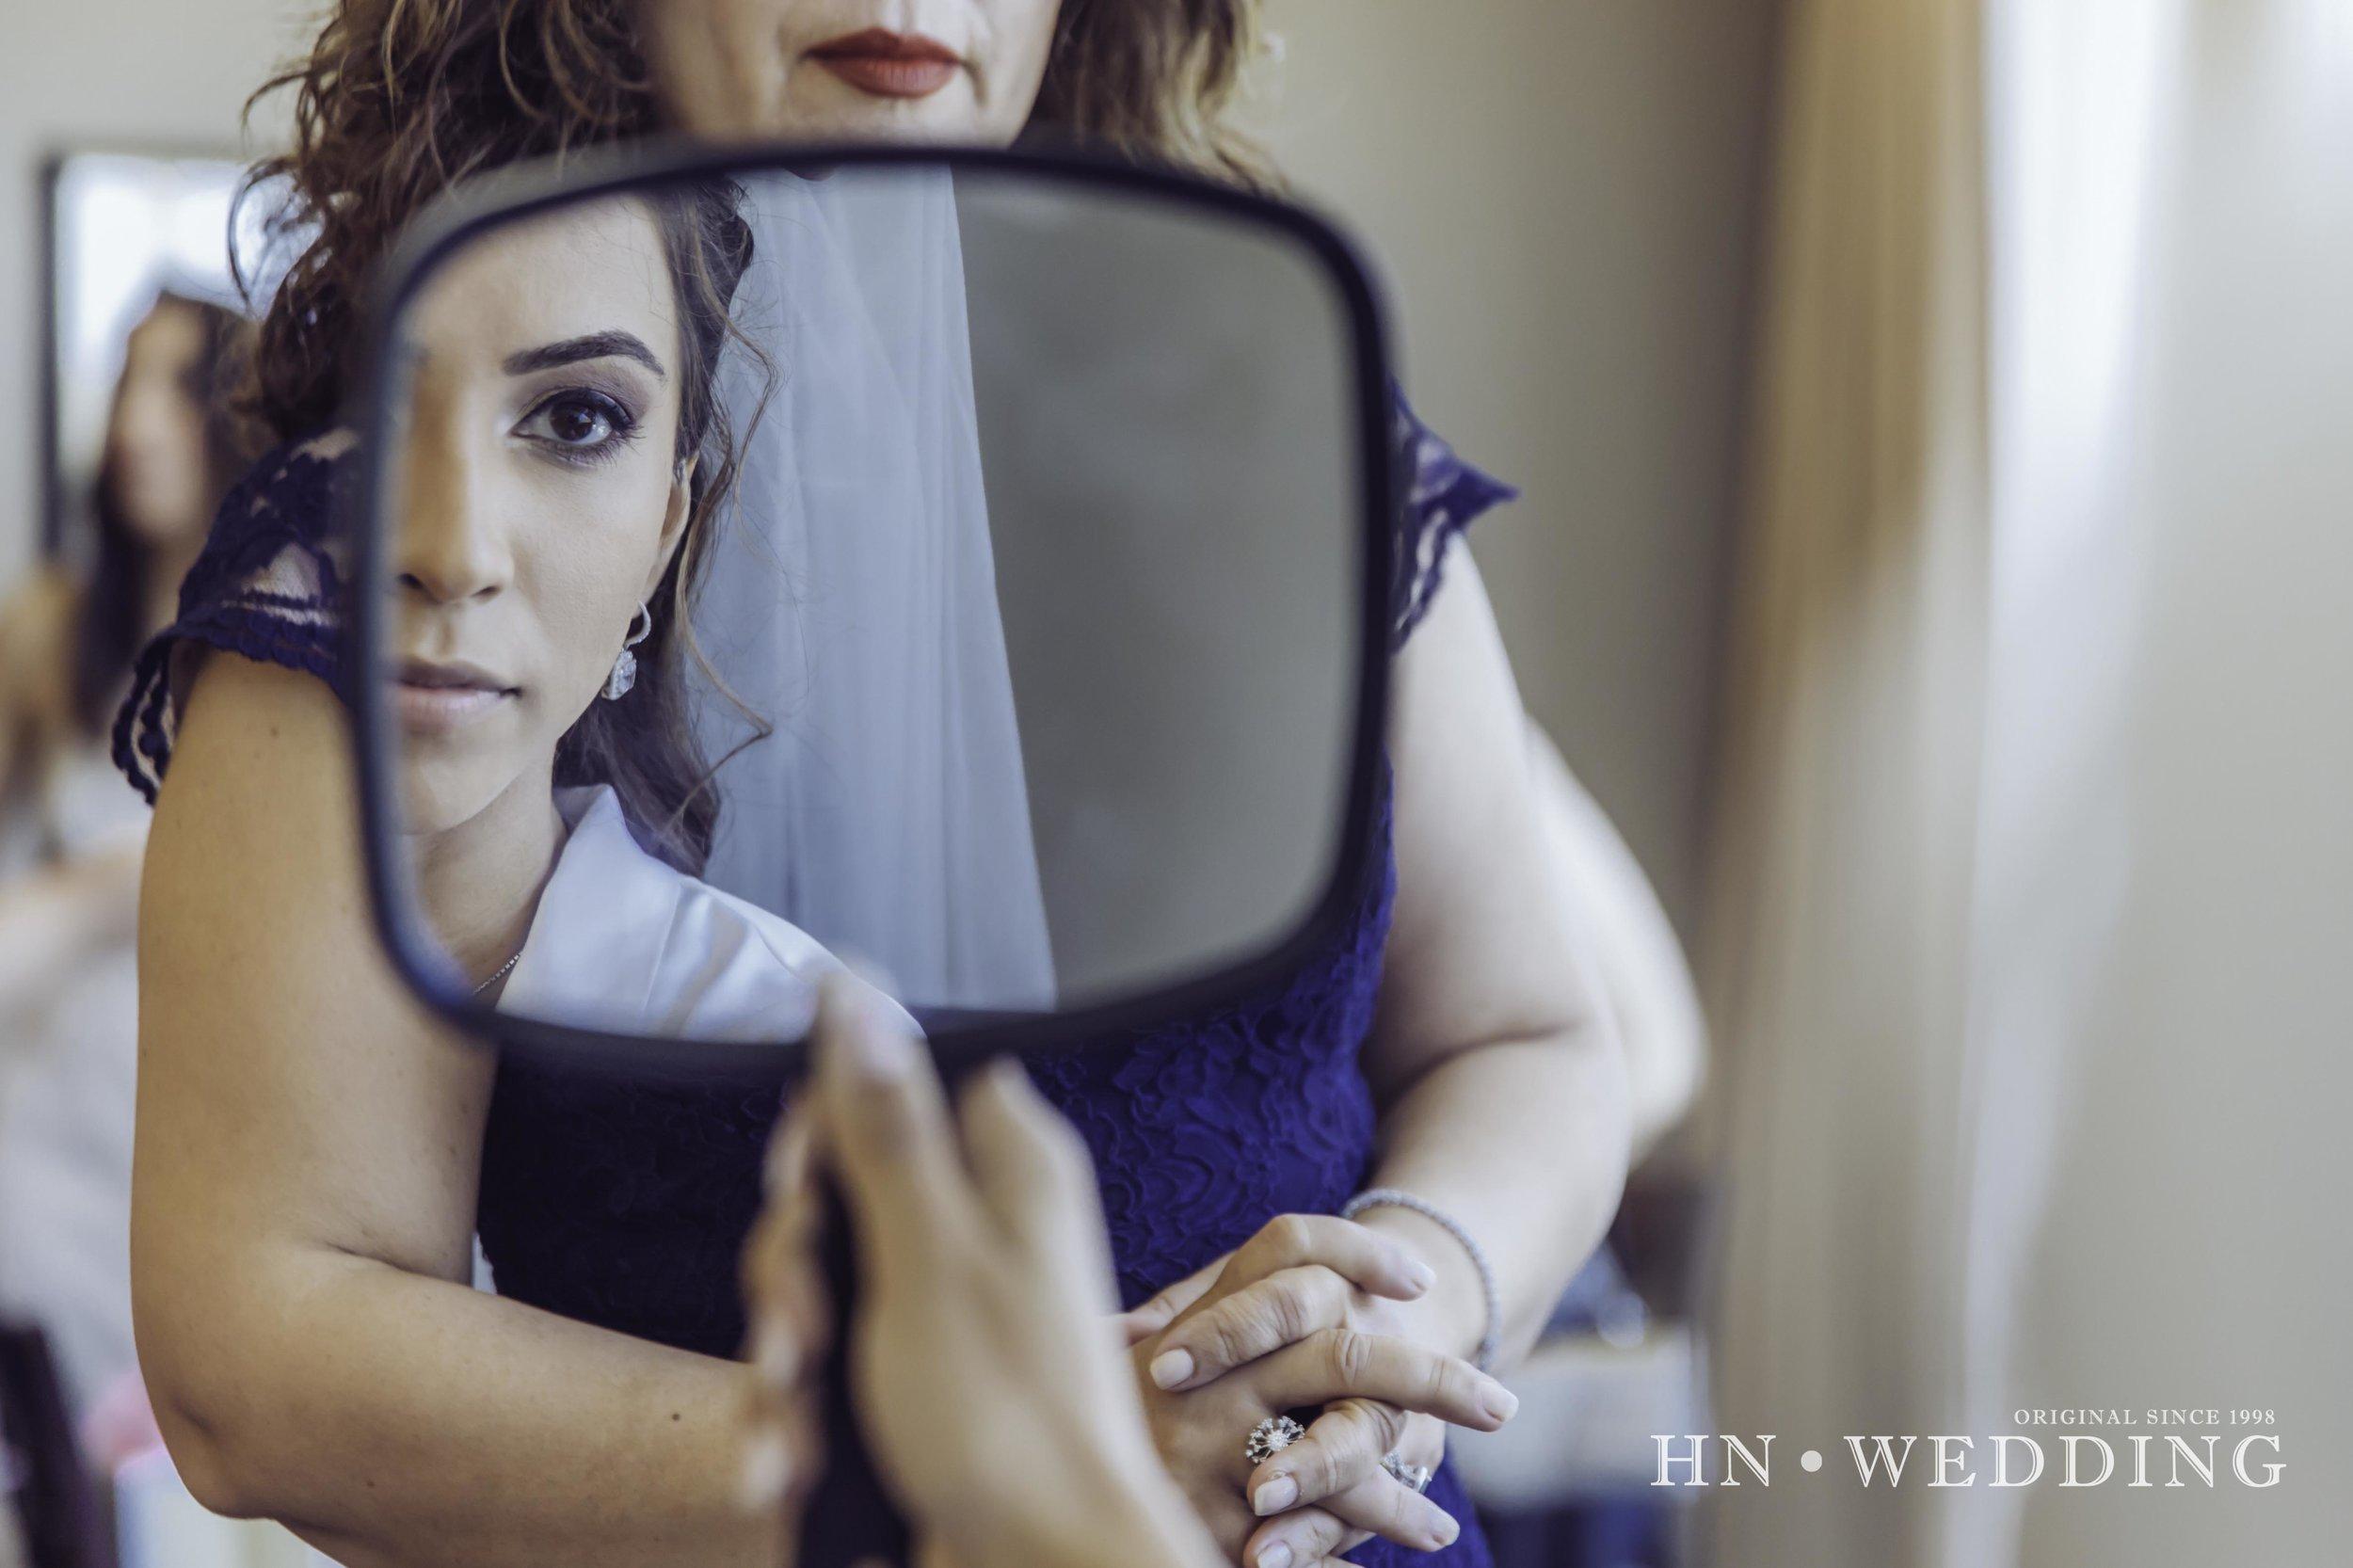 HNwedding-20161012-wedding-3334.jpg